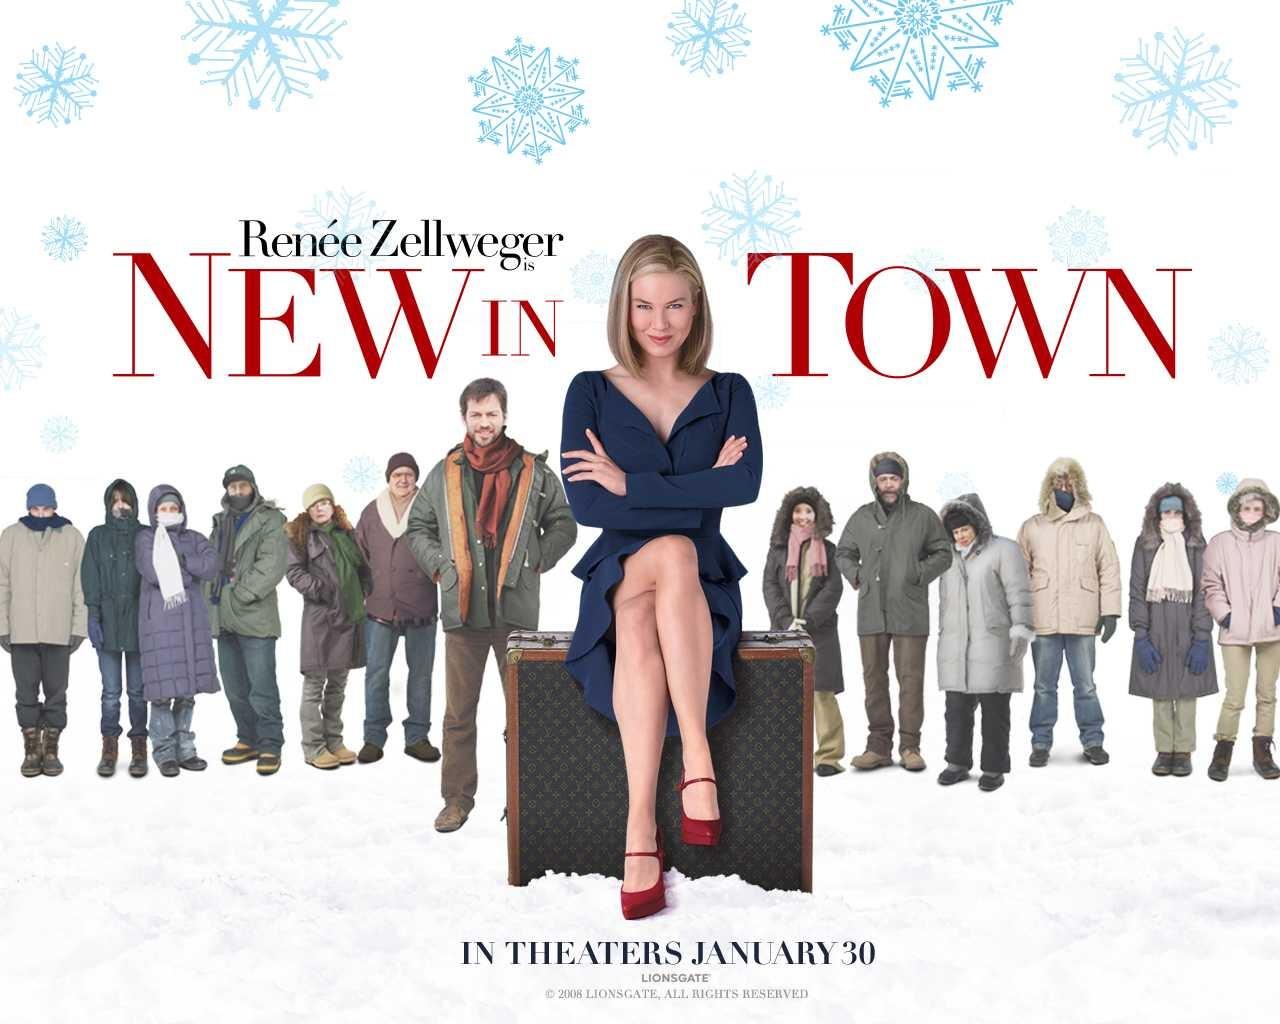 Wallpaper del film New in Town